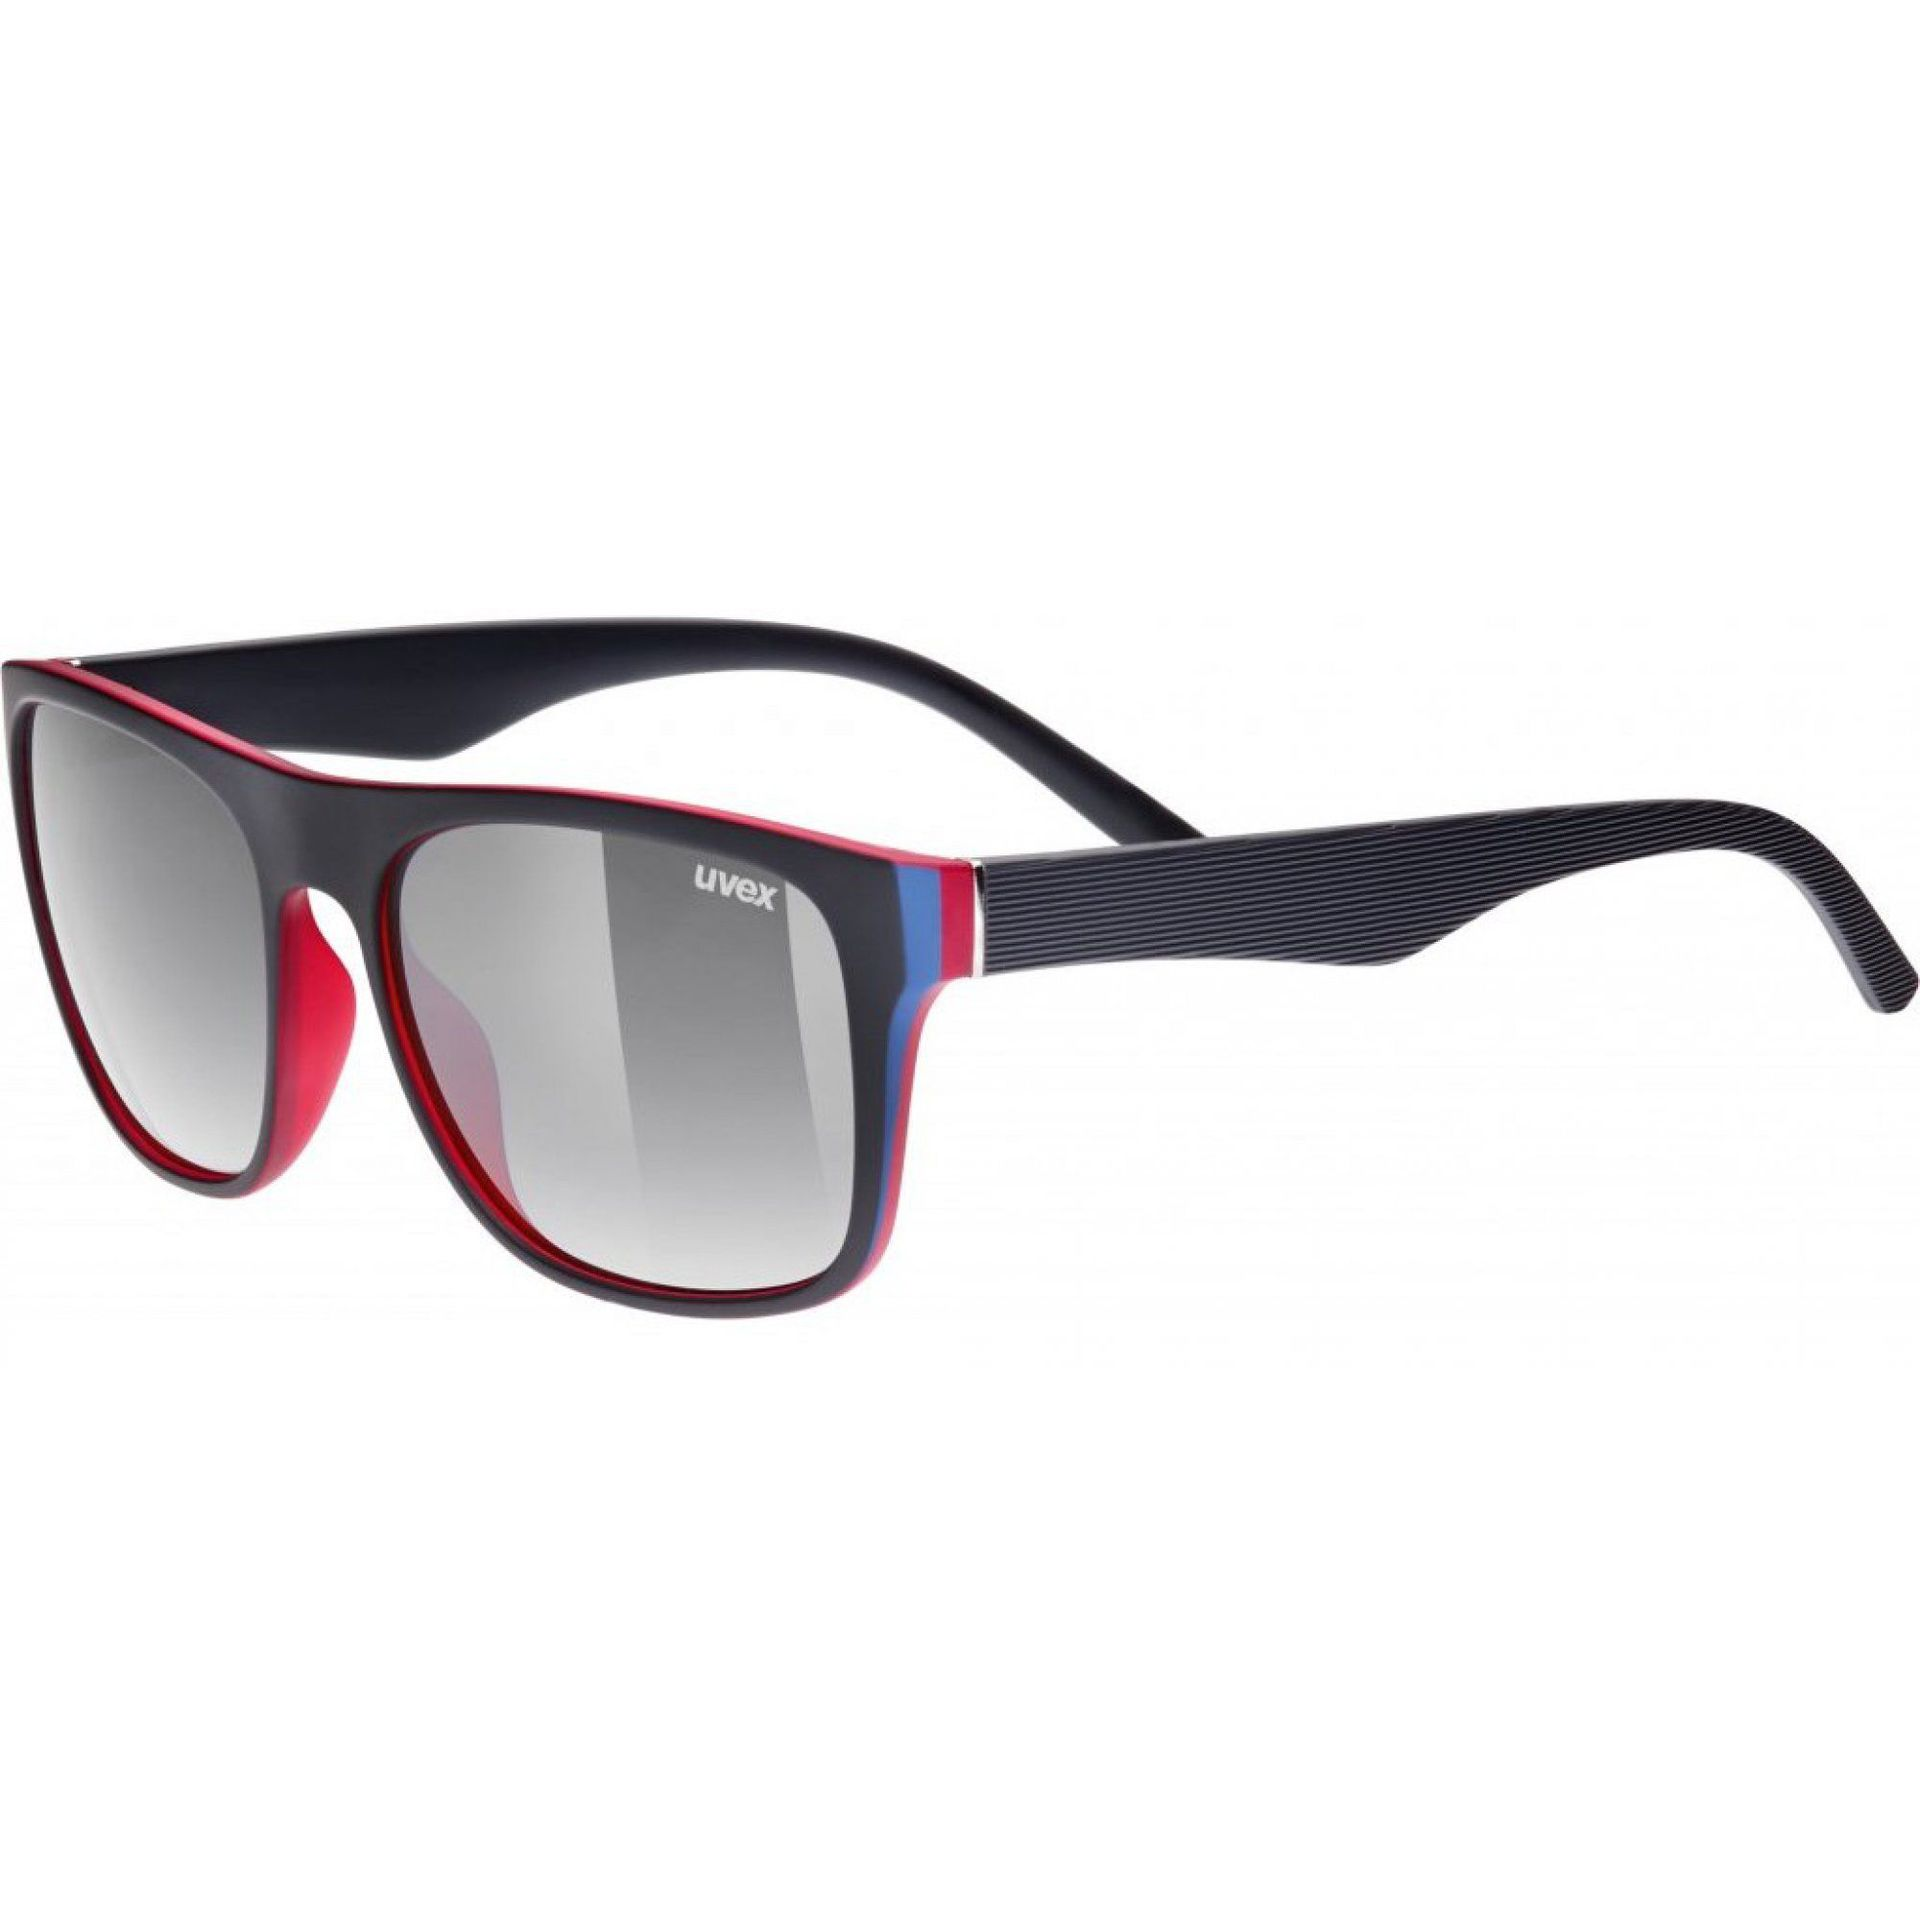 OKULARY UVEX LGL 26 BLACK RED